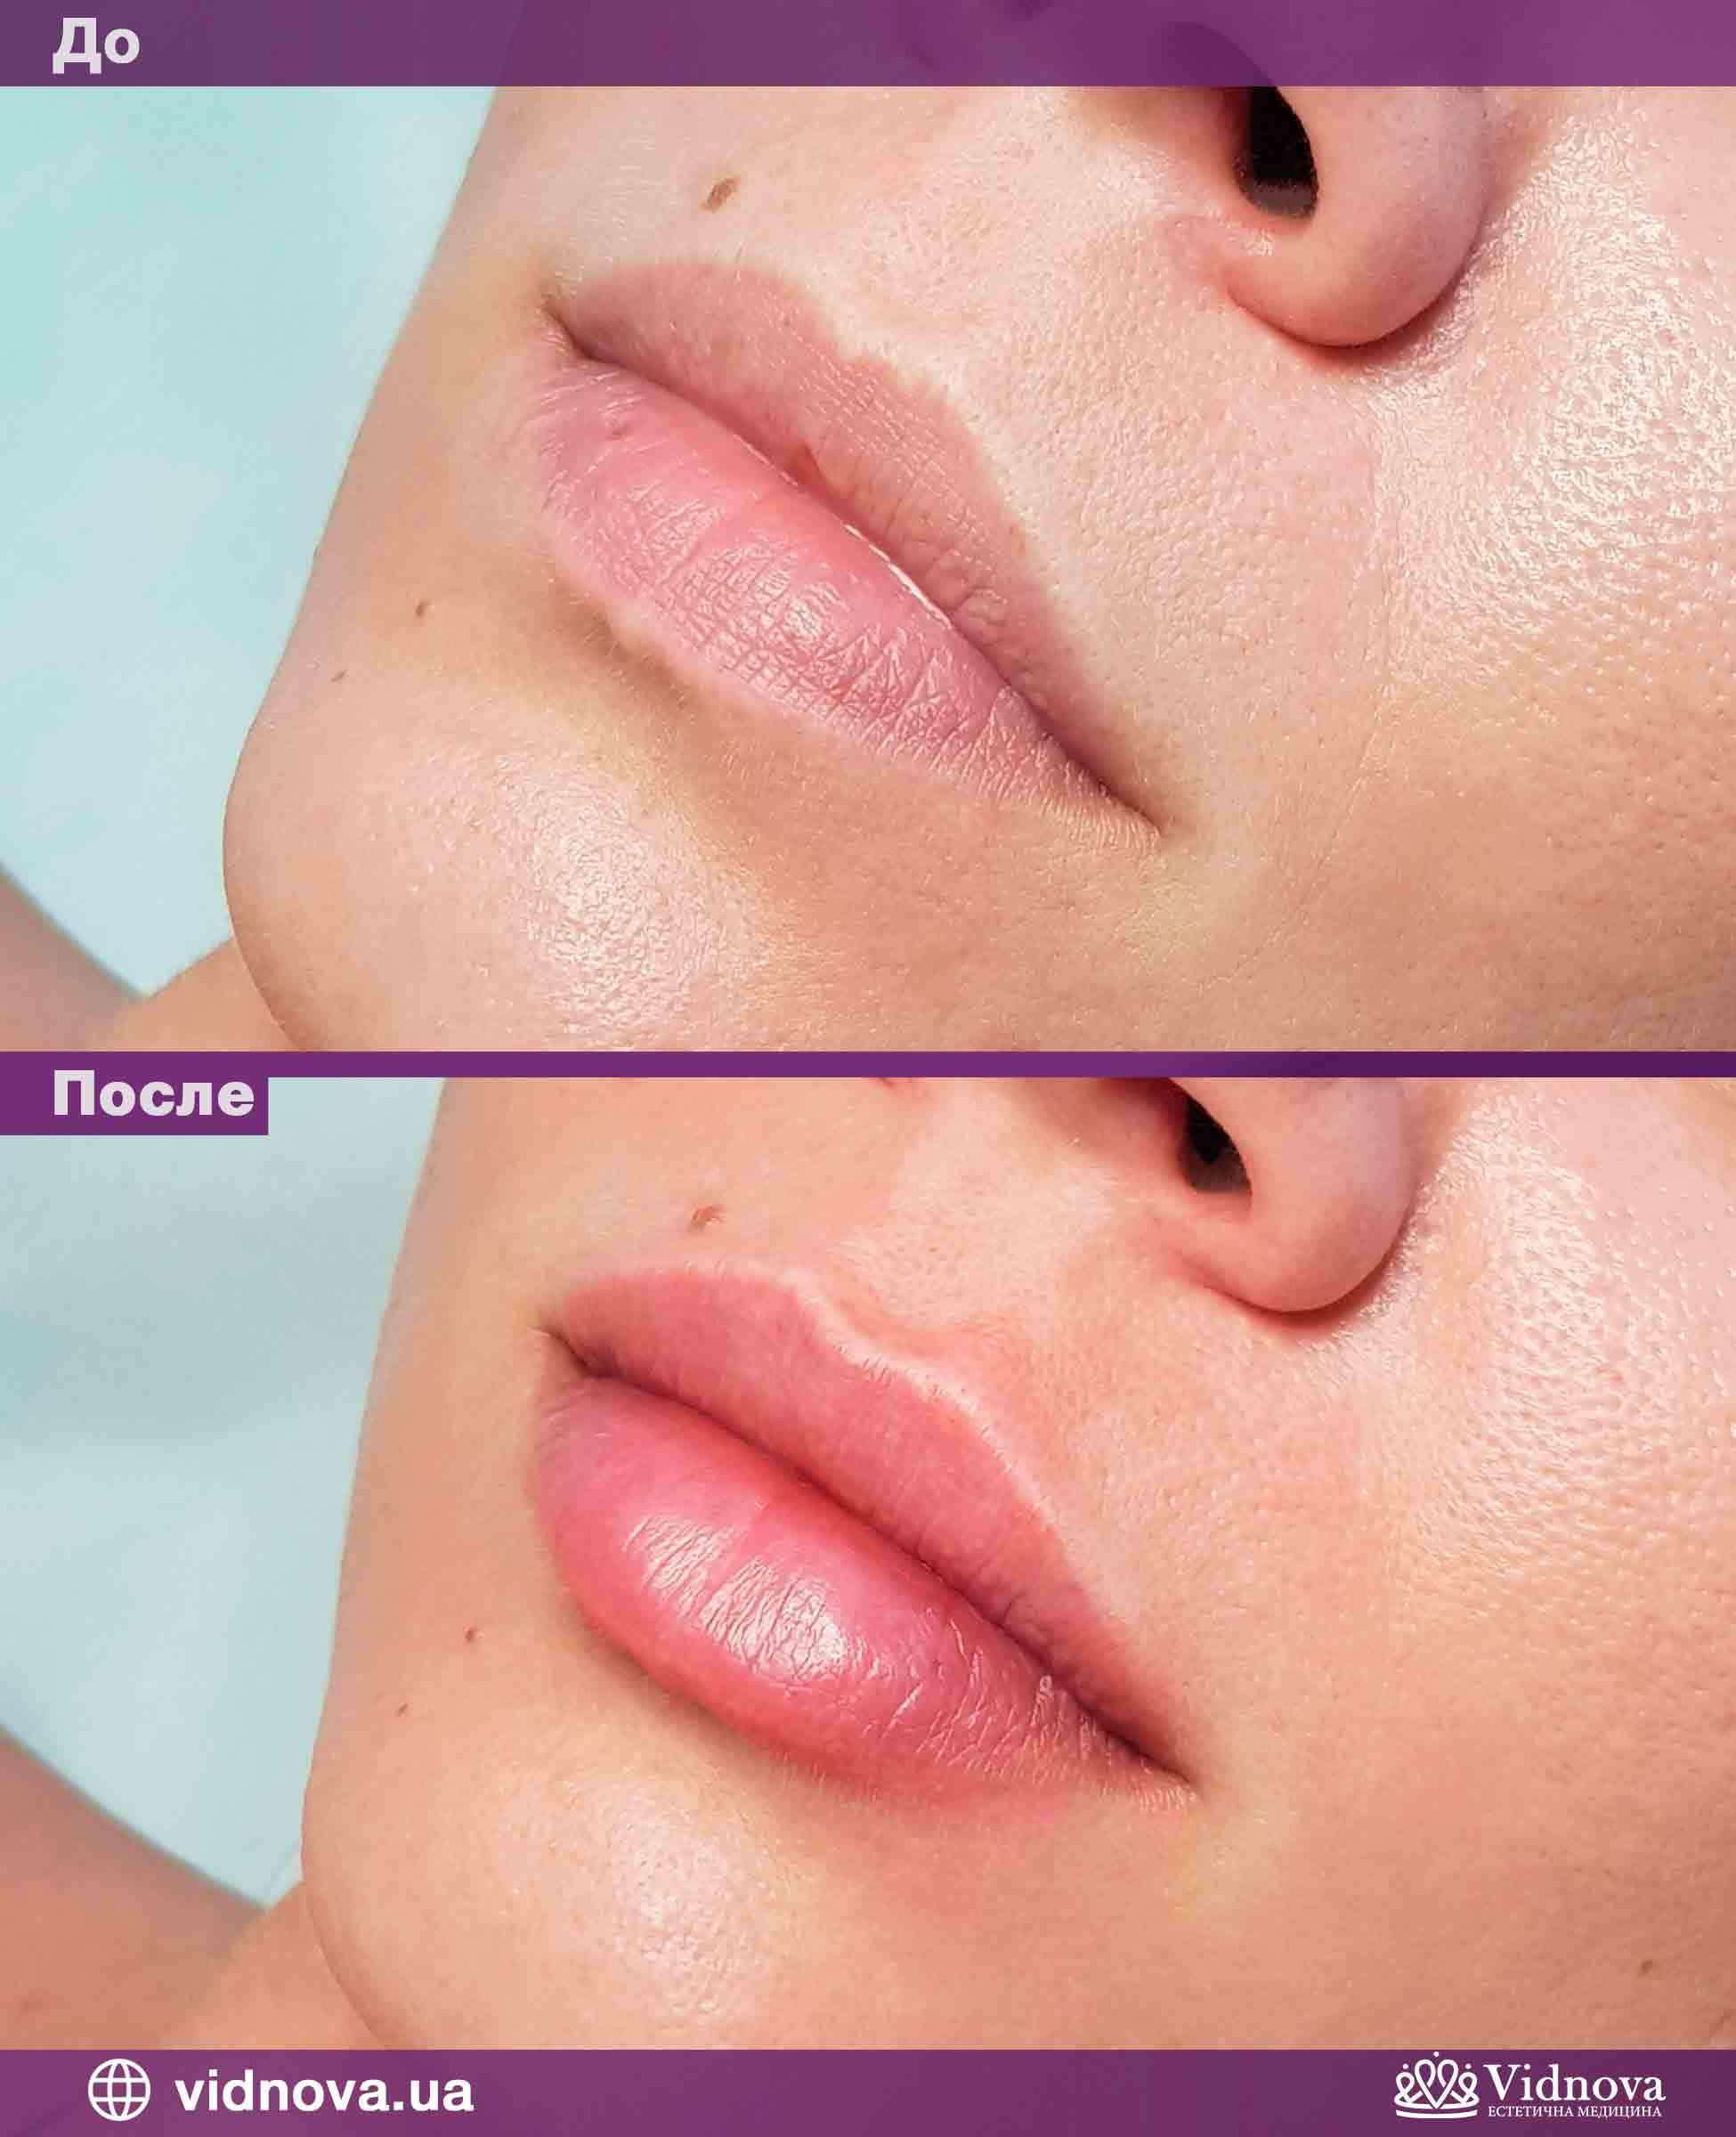 Увеличение губ: Фото До и После - Пример №1-1 - Клиника Vidnova